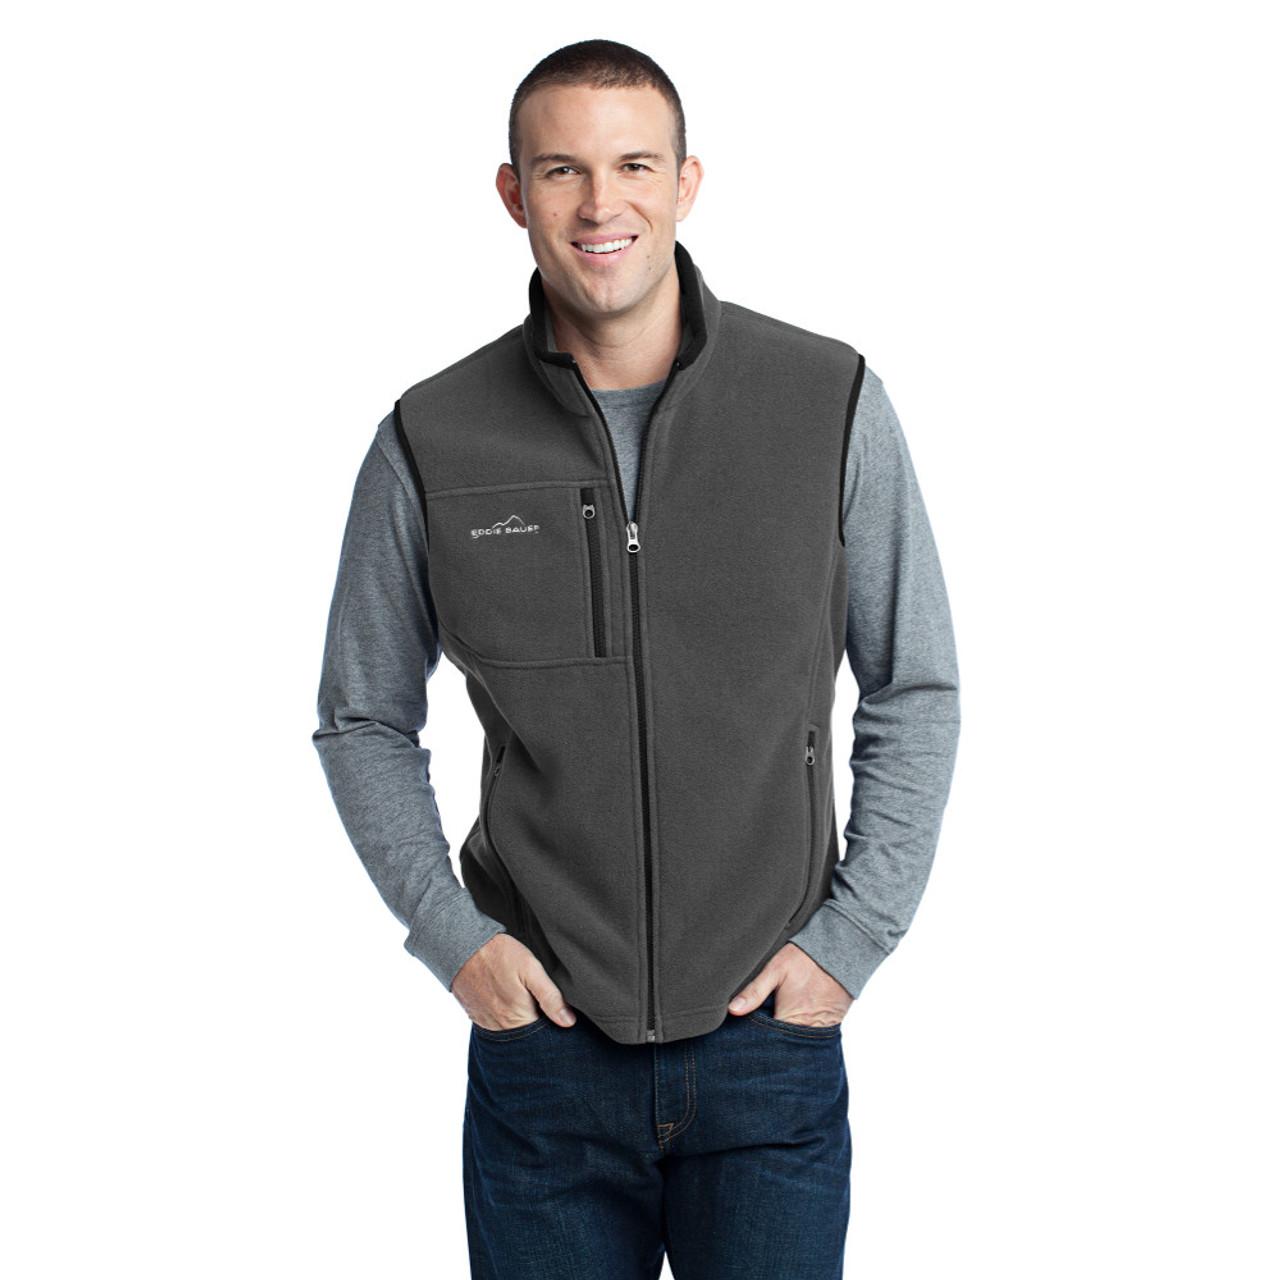 Medium Gray MEN'S FWS Eddie Bauer® - Fleece Vest  - 30% OFF